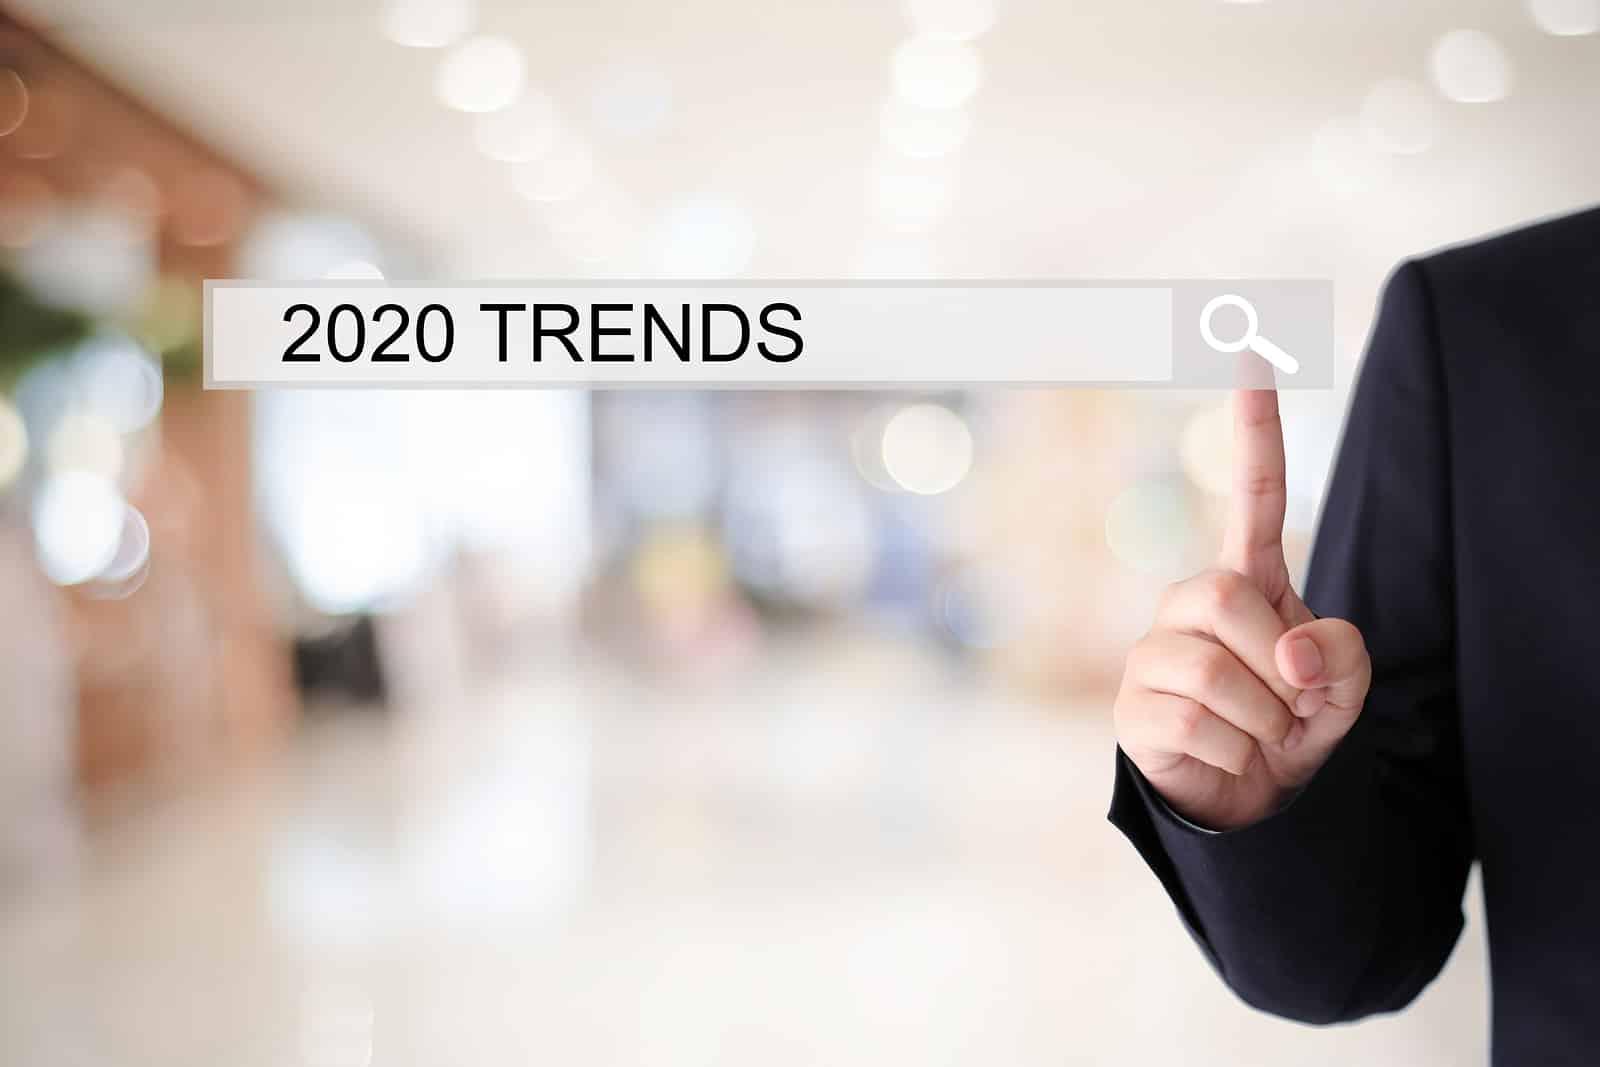 online reputation management trends 2020